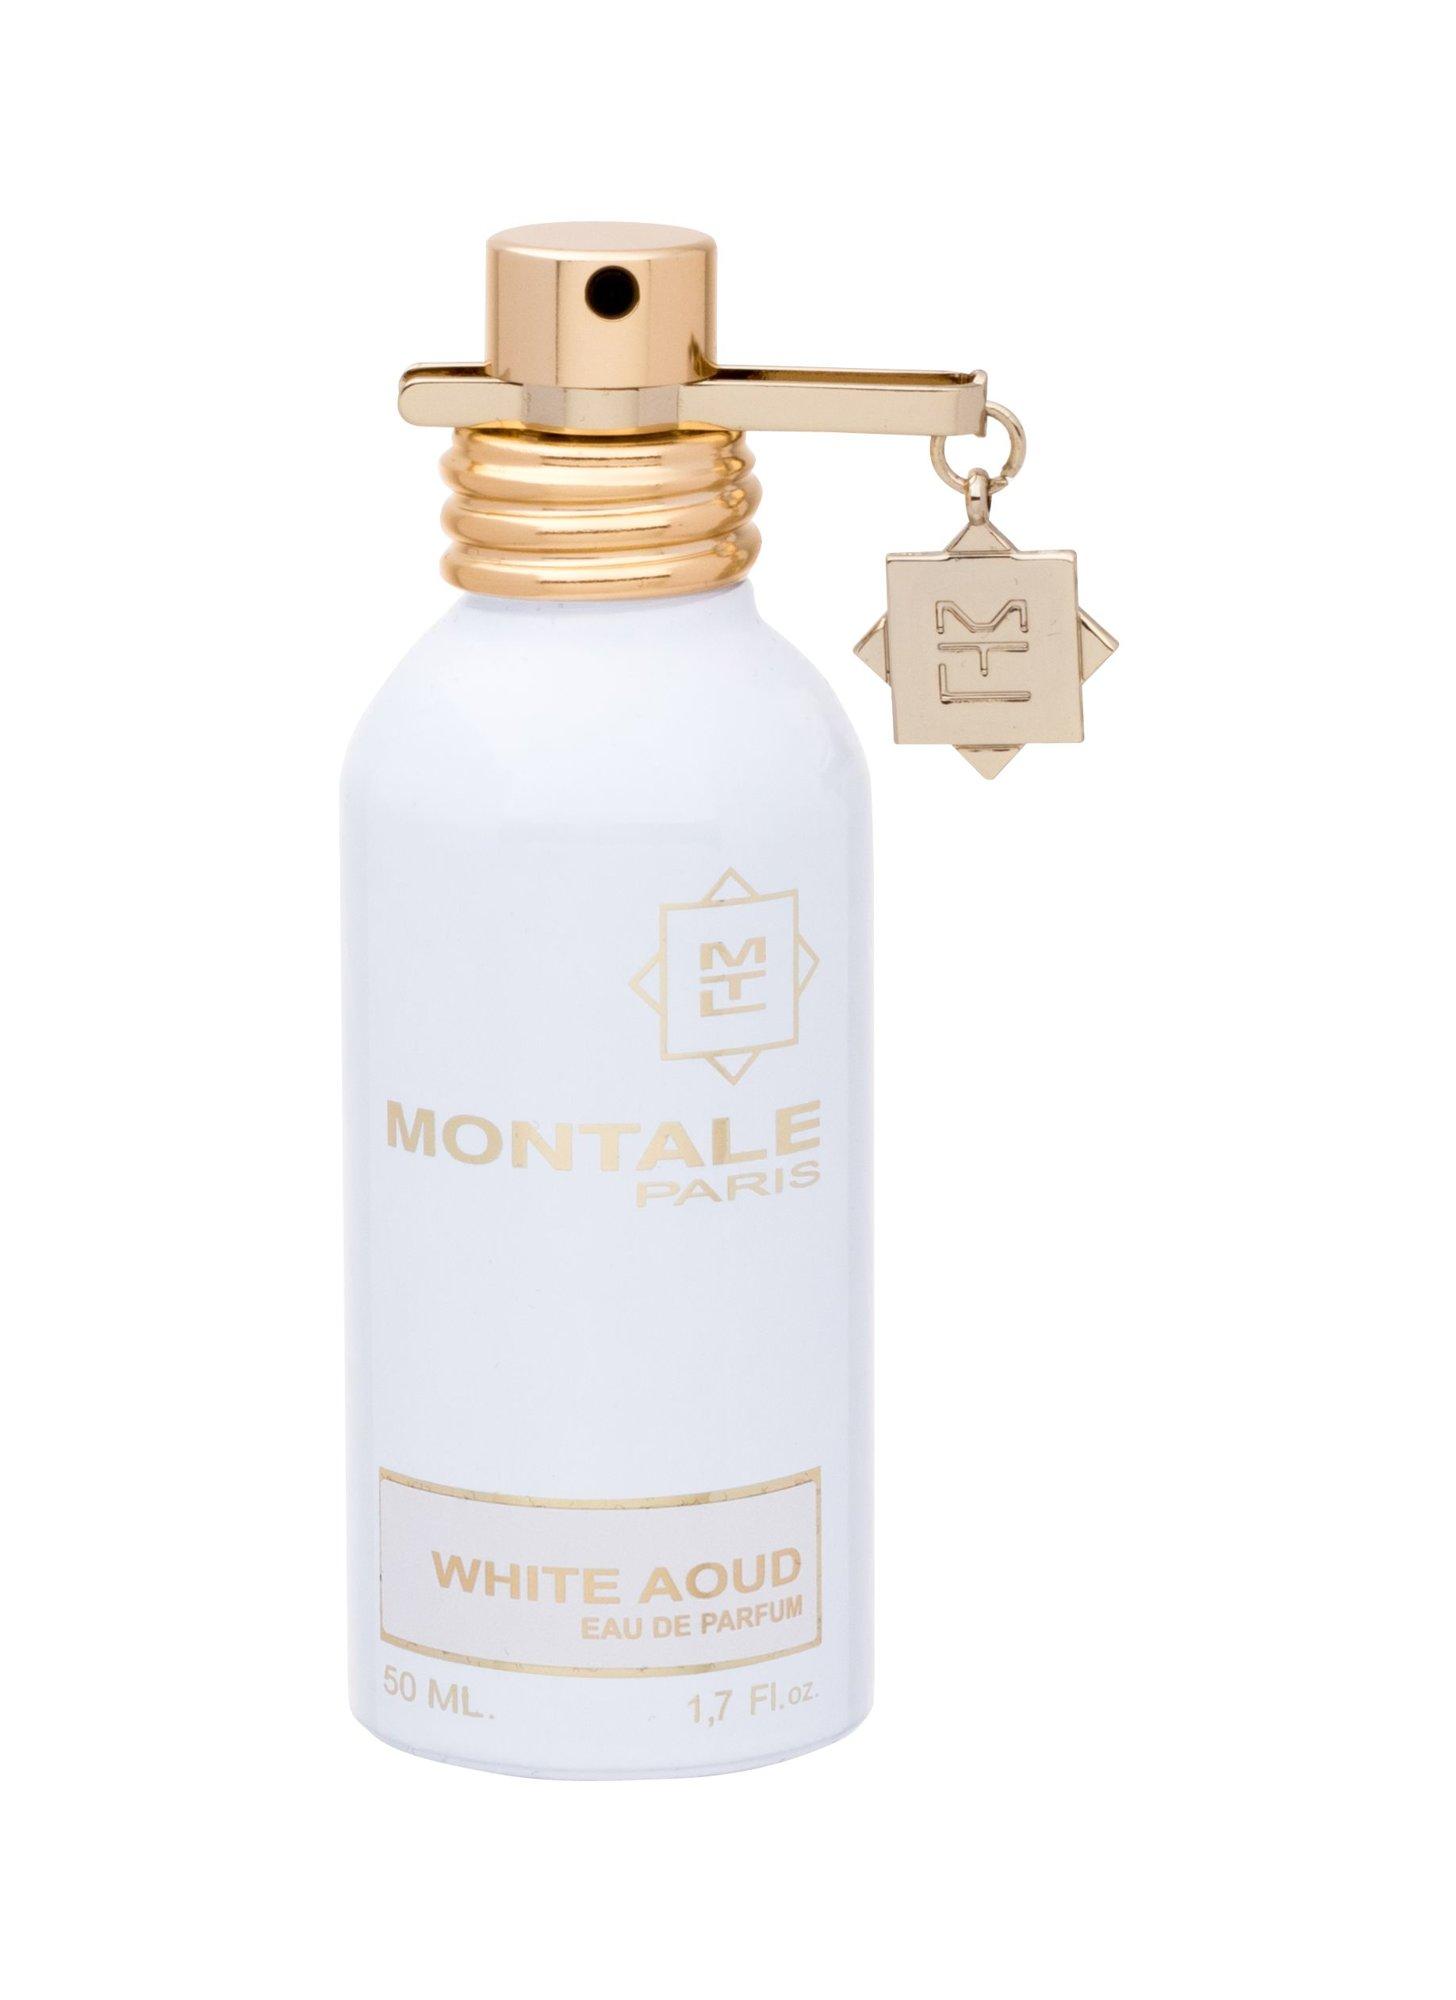 Montale Paris White Aoud EDP 50ml